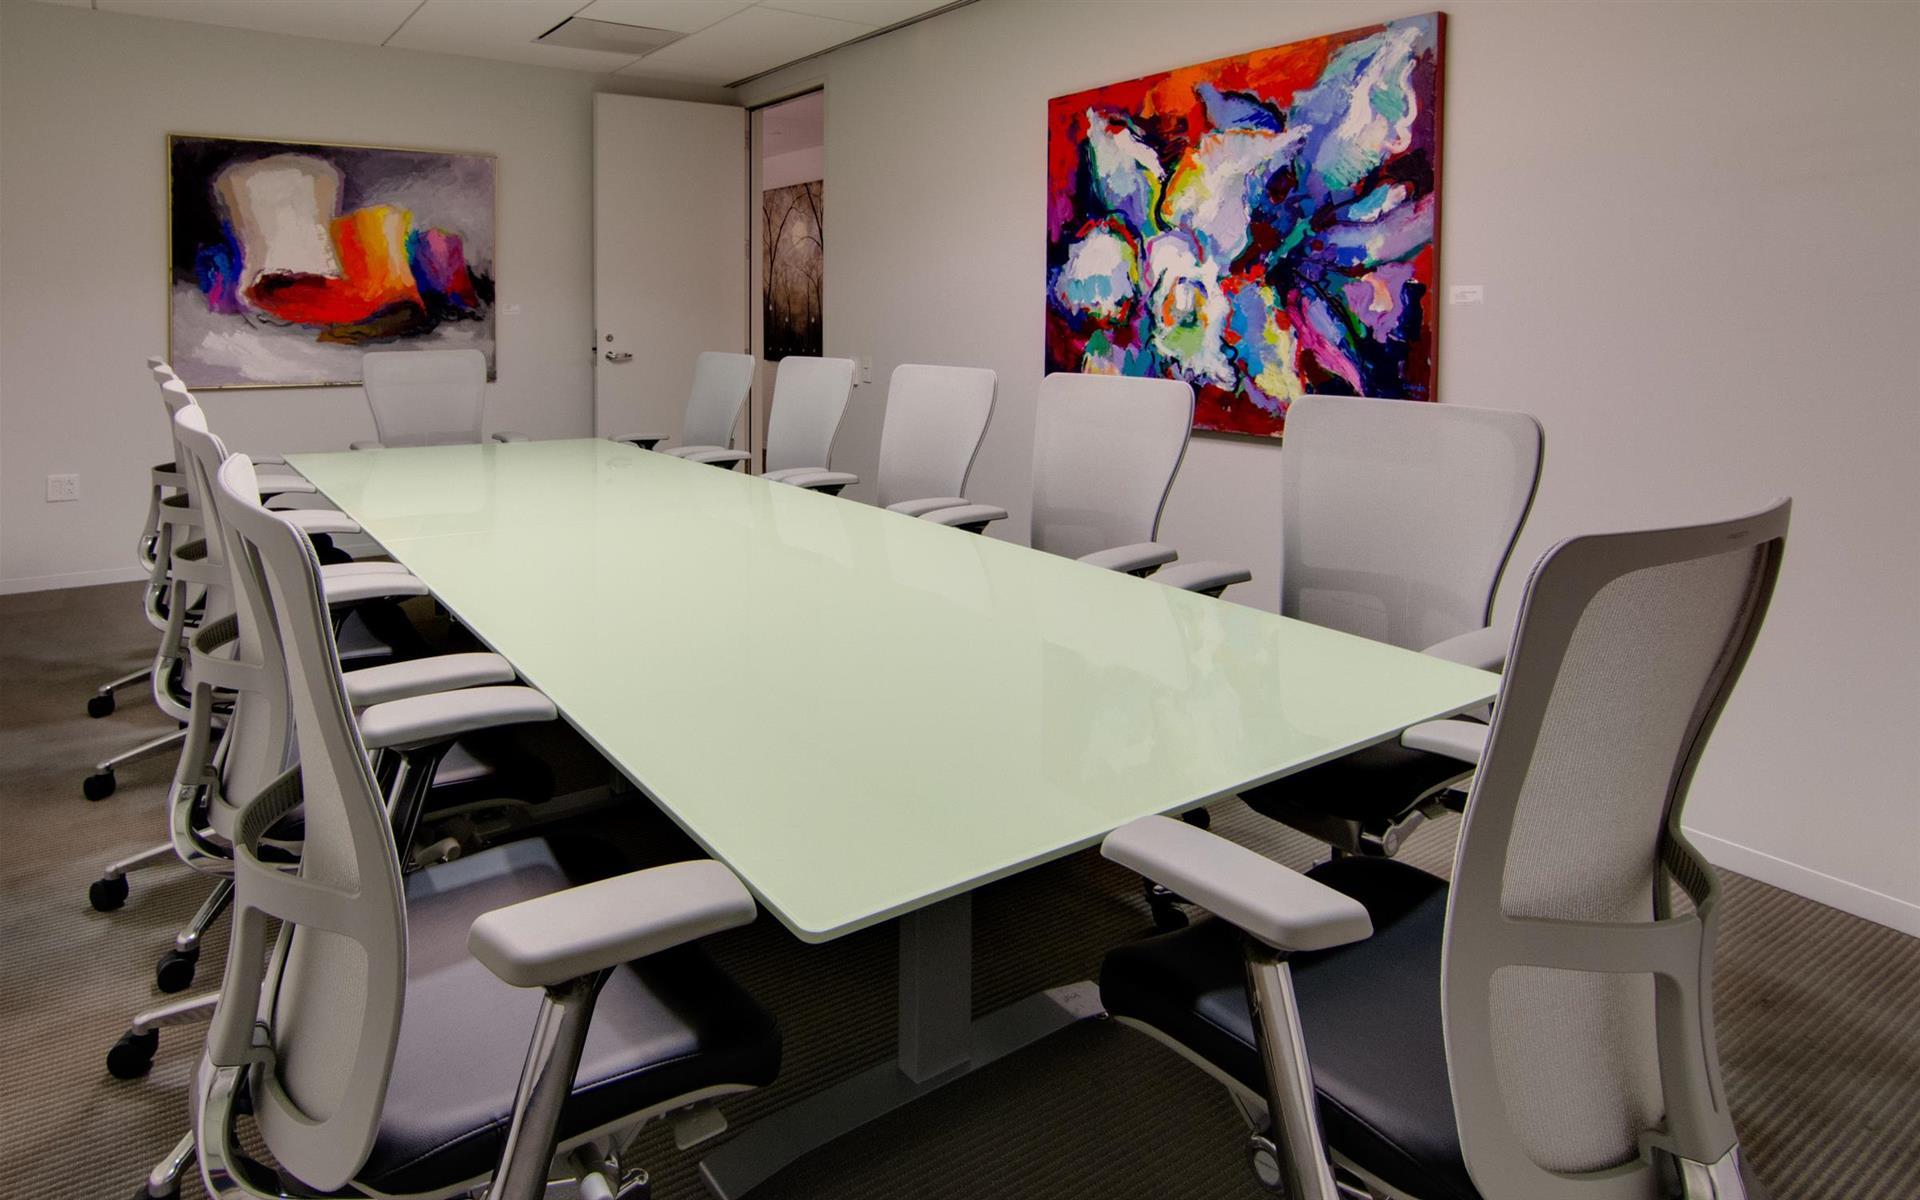 AdvantEdge BC - Downtown Center - Conference Room #1, Suite 800